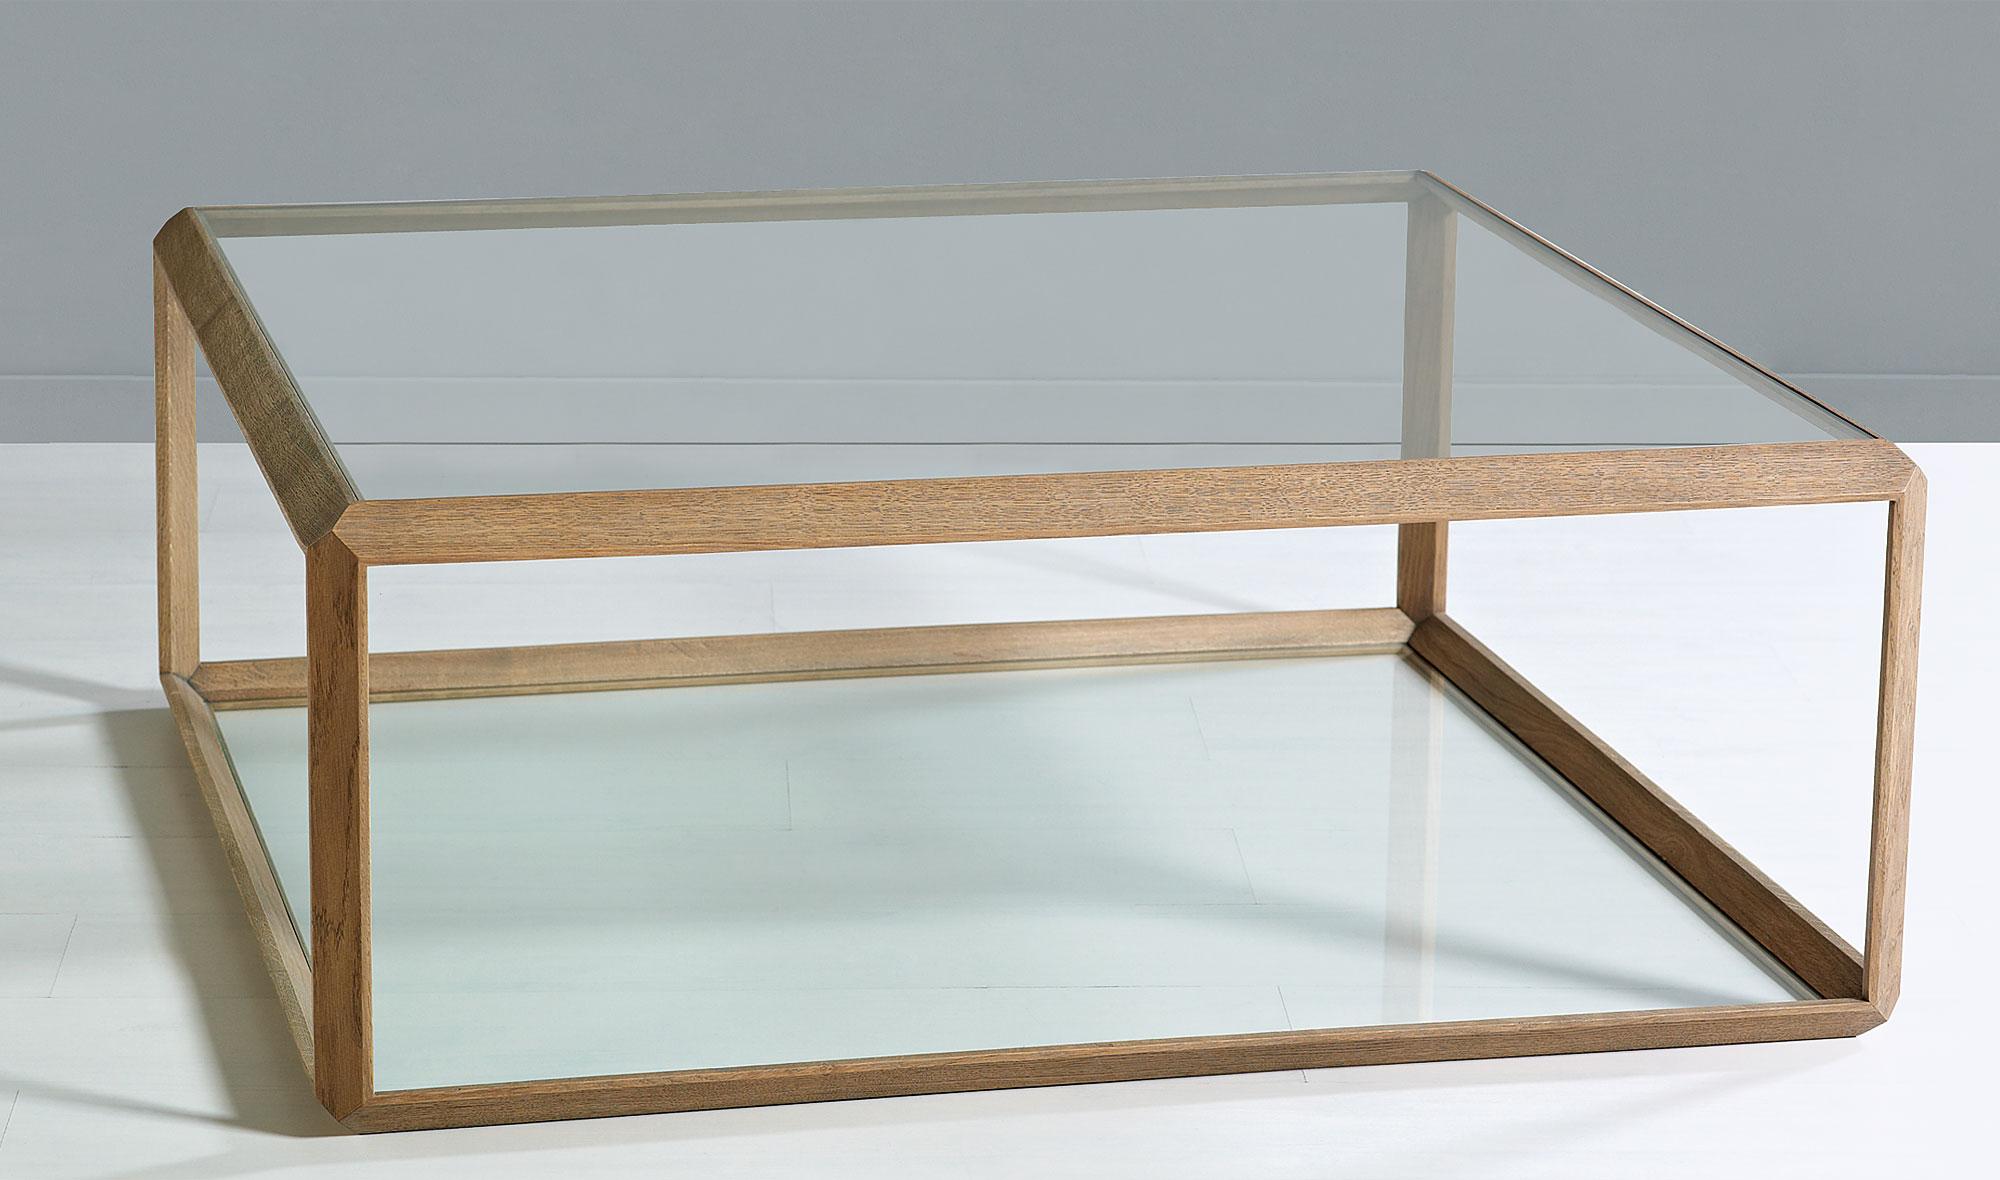 Mesa Centro N Rdica Roble Nature Essence De Lujo En  # Muebles Geometricos